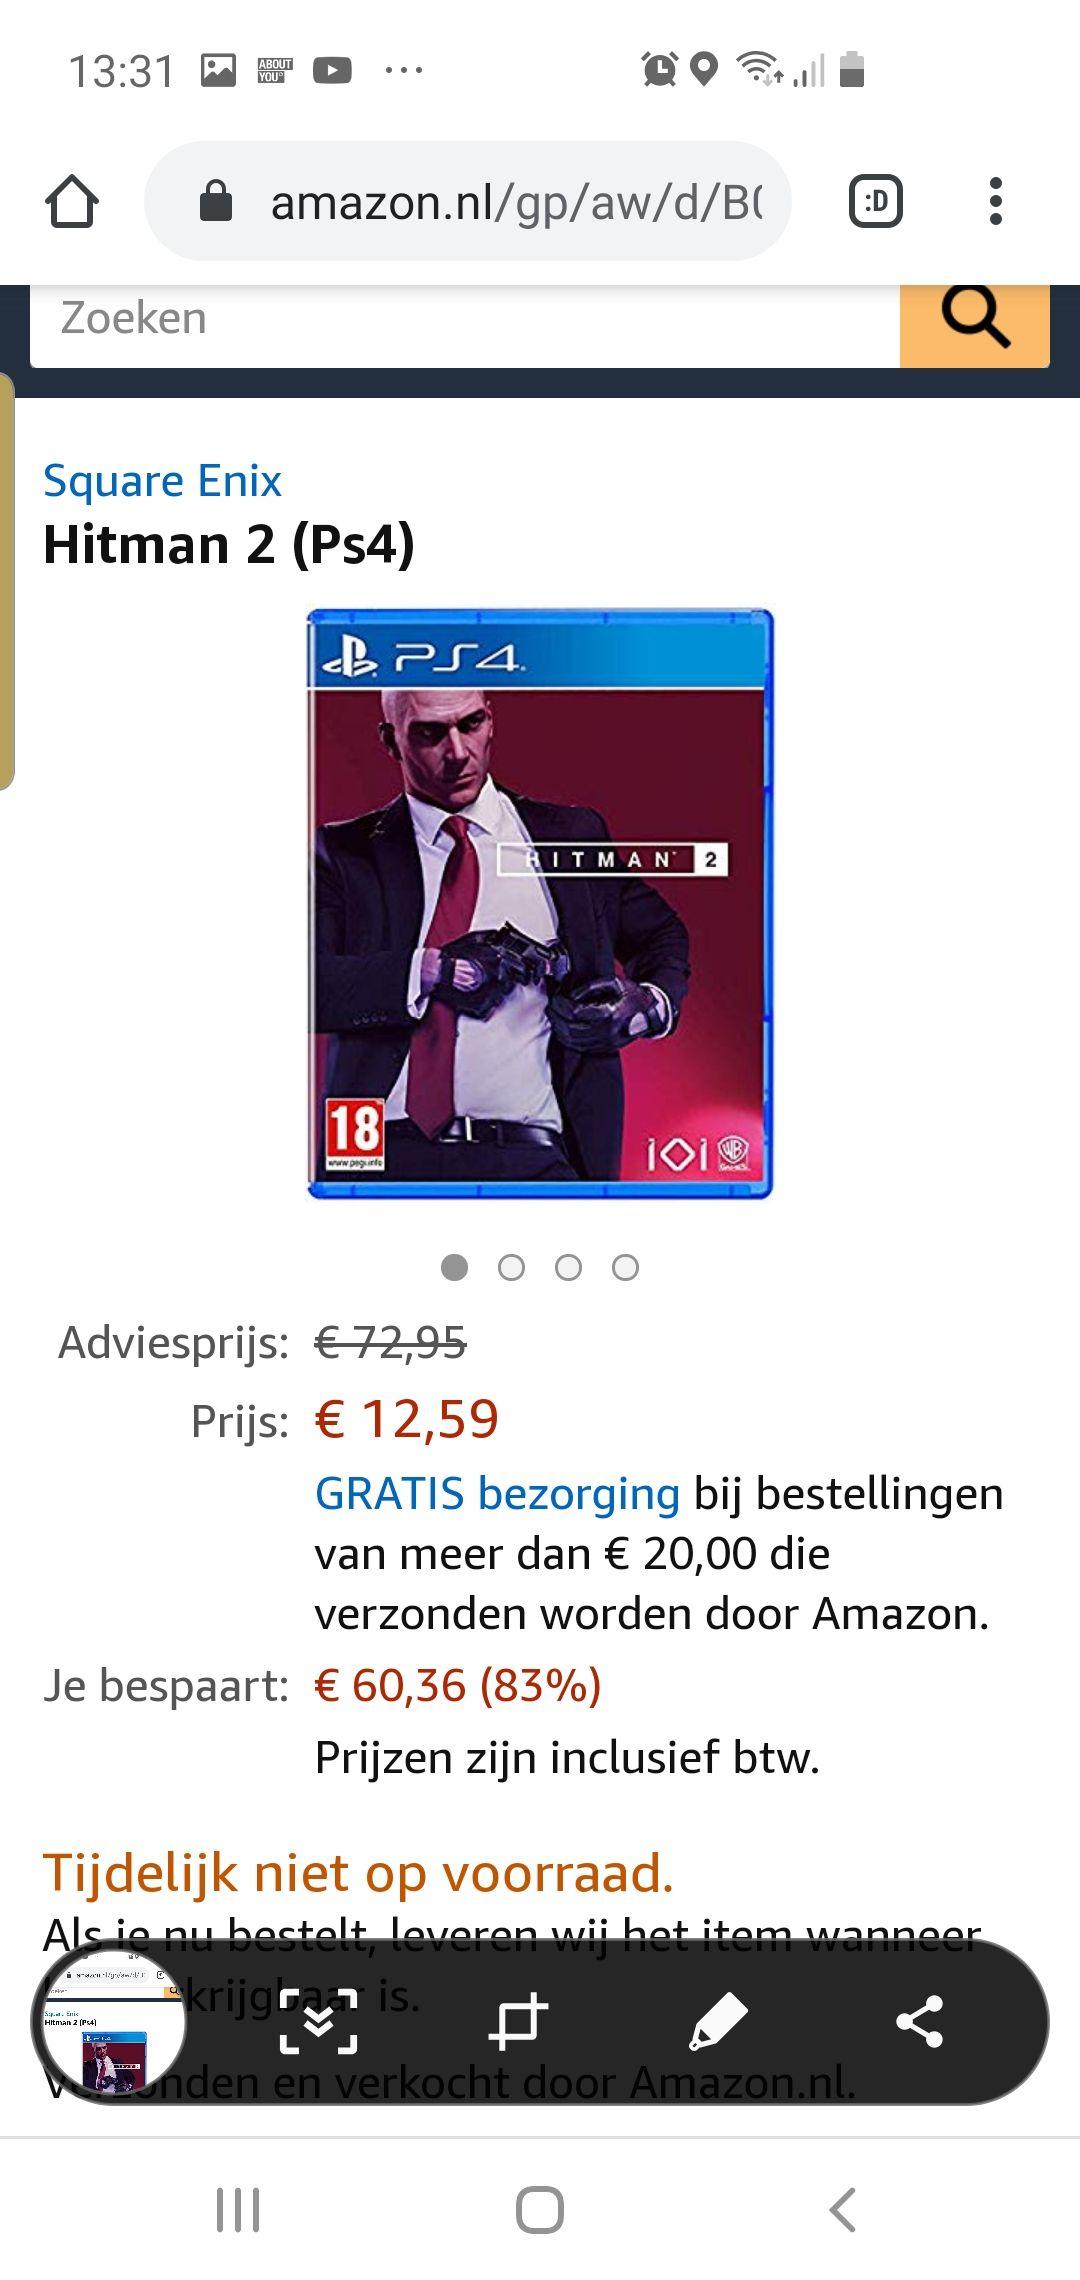 Hitman 2 playstation 4 editie @amazon.nl